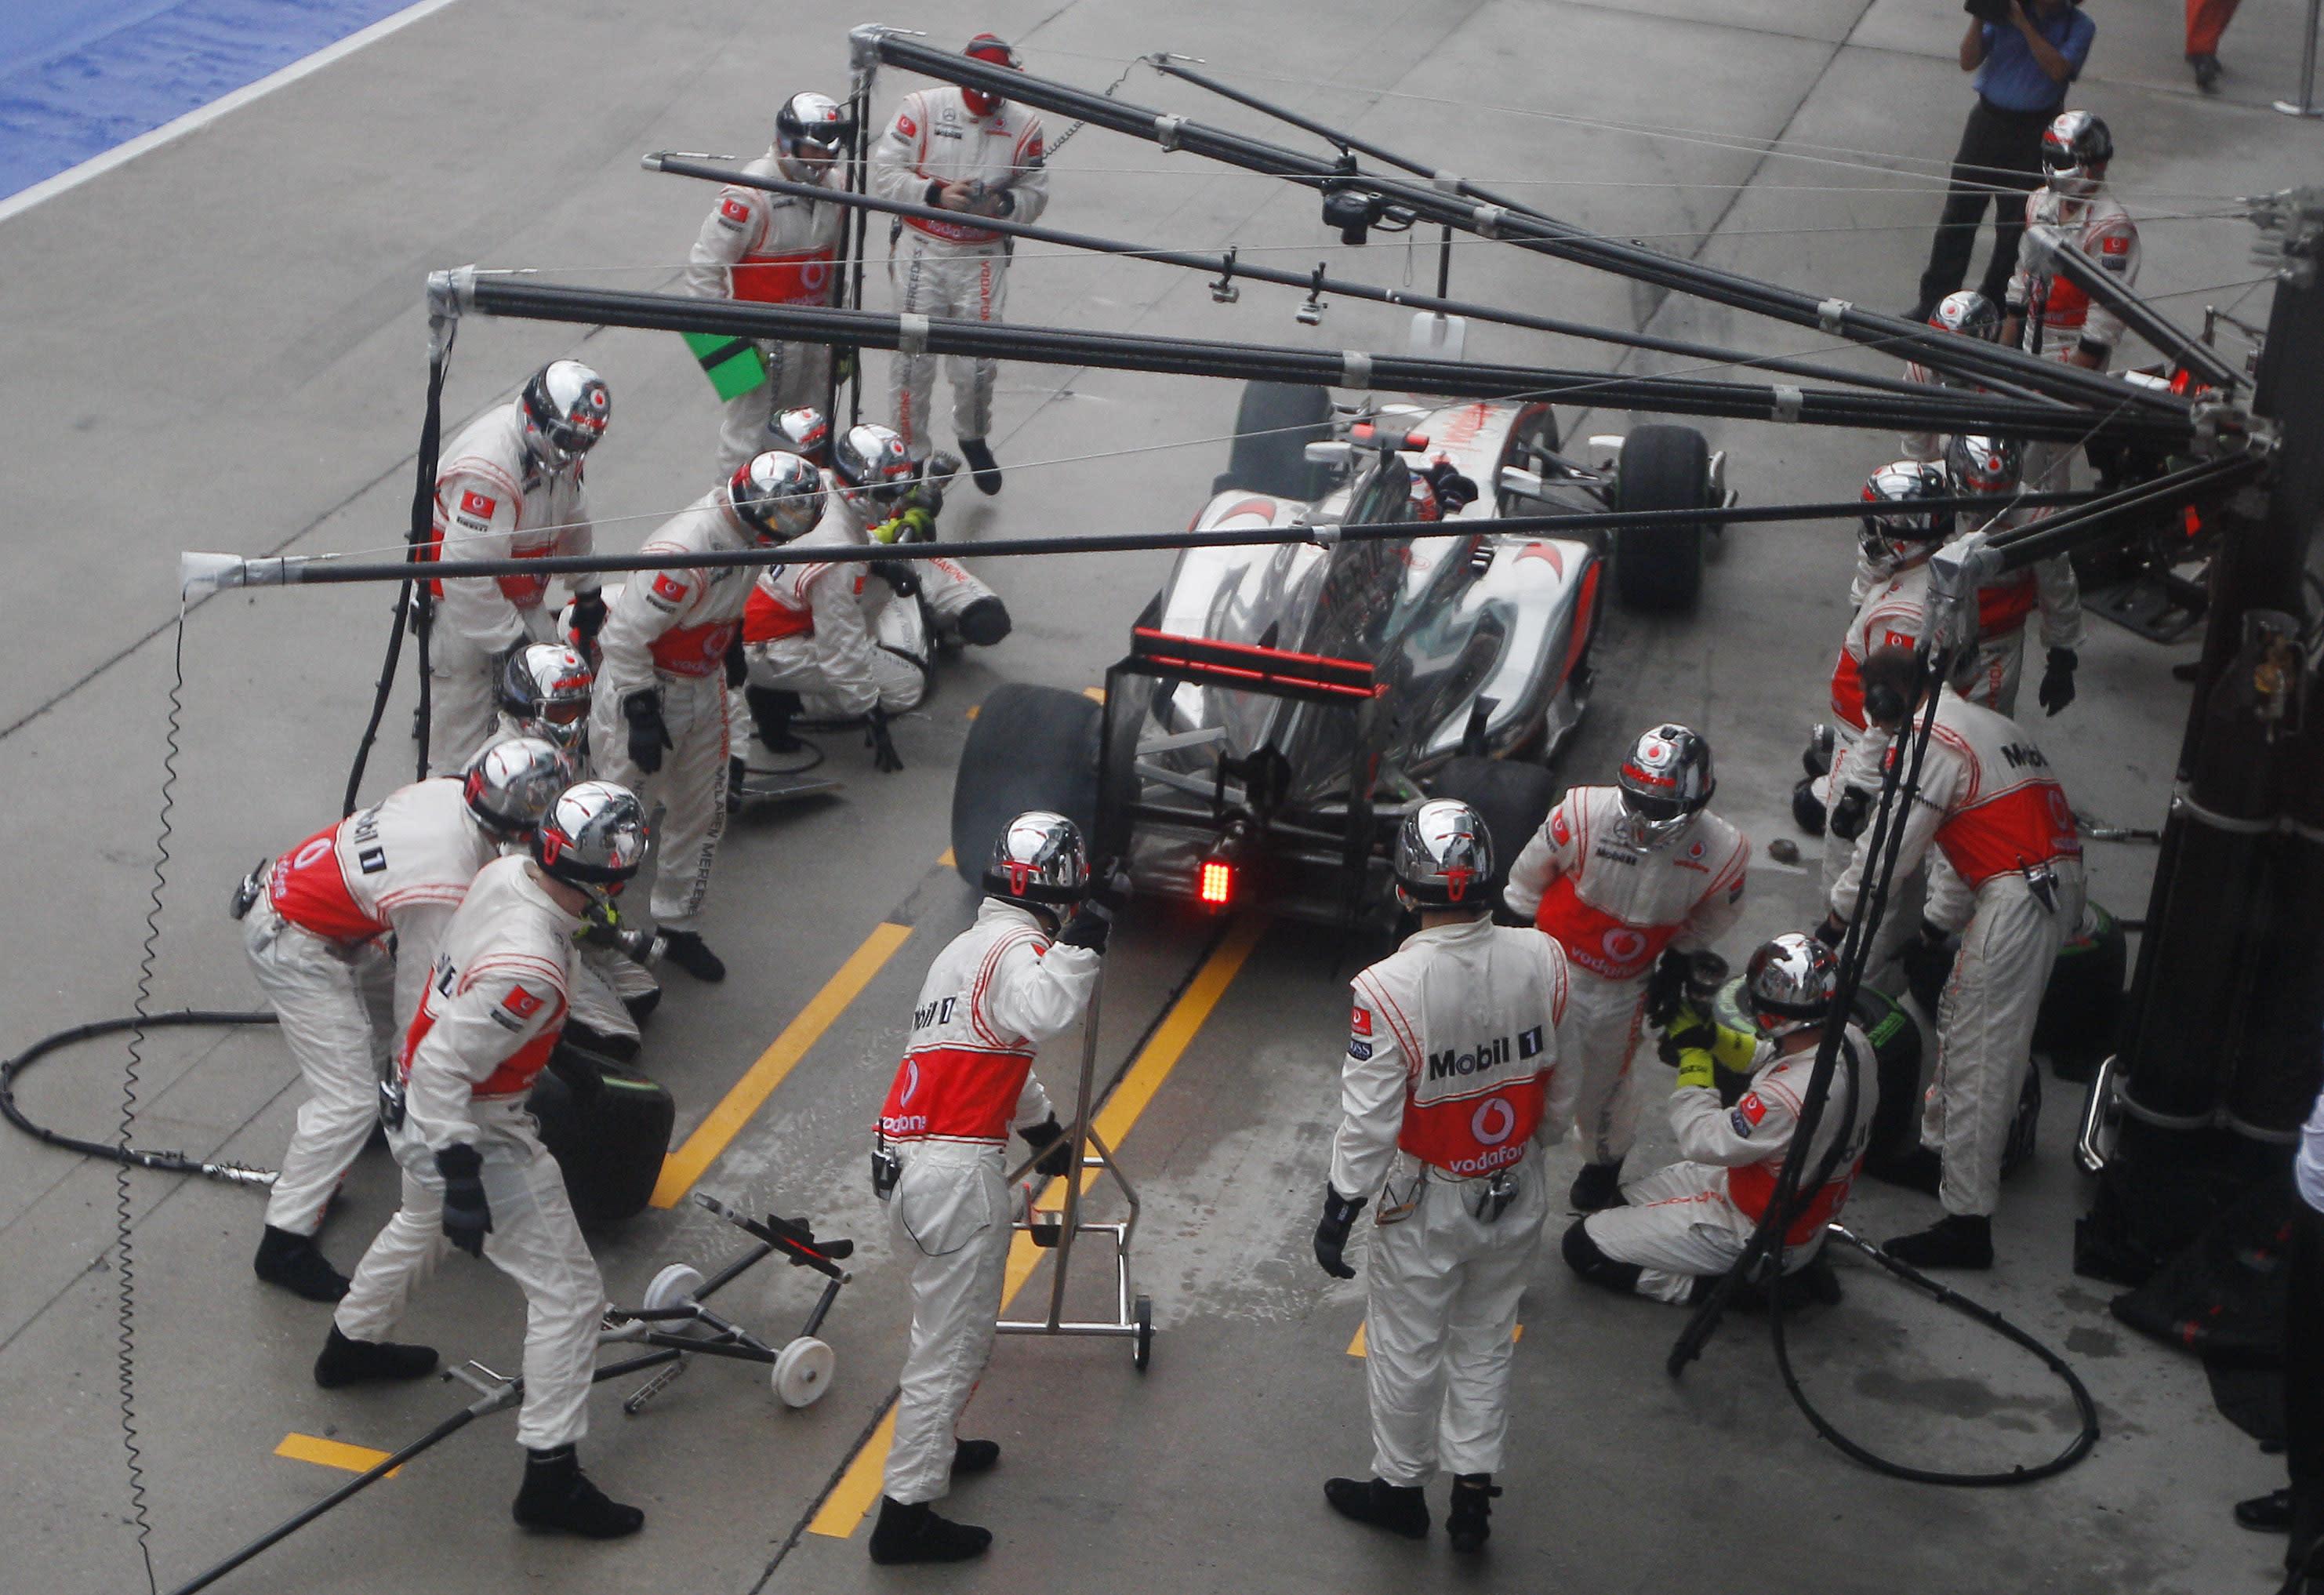 Ferrari's Alonso wins F1 Malaysian GP